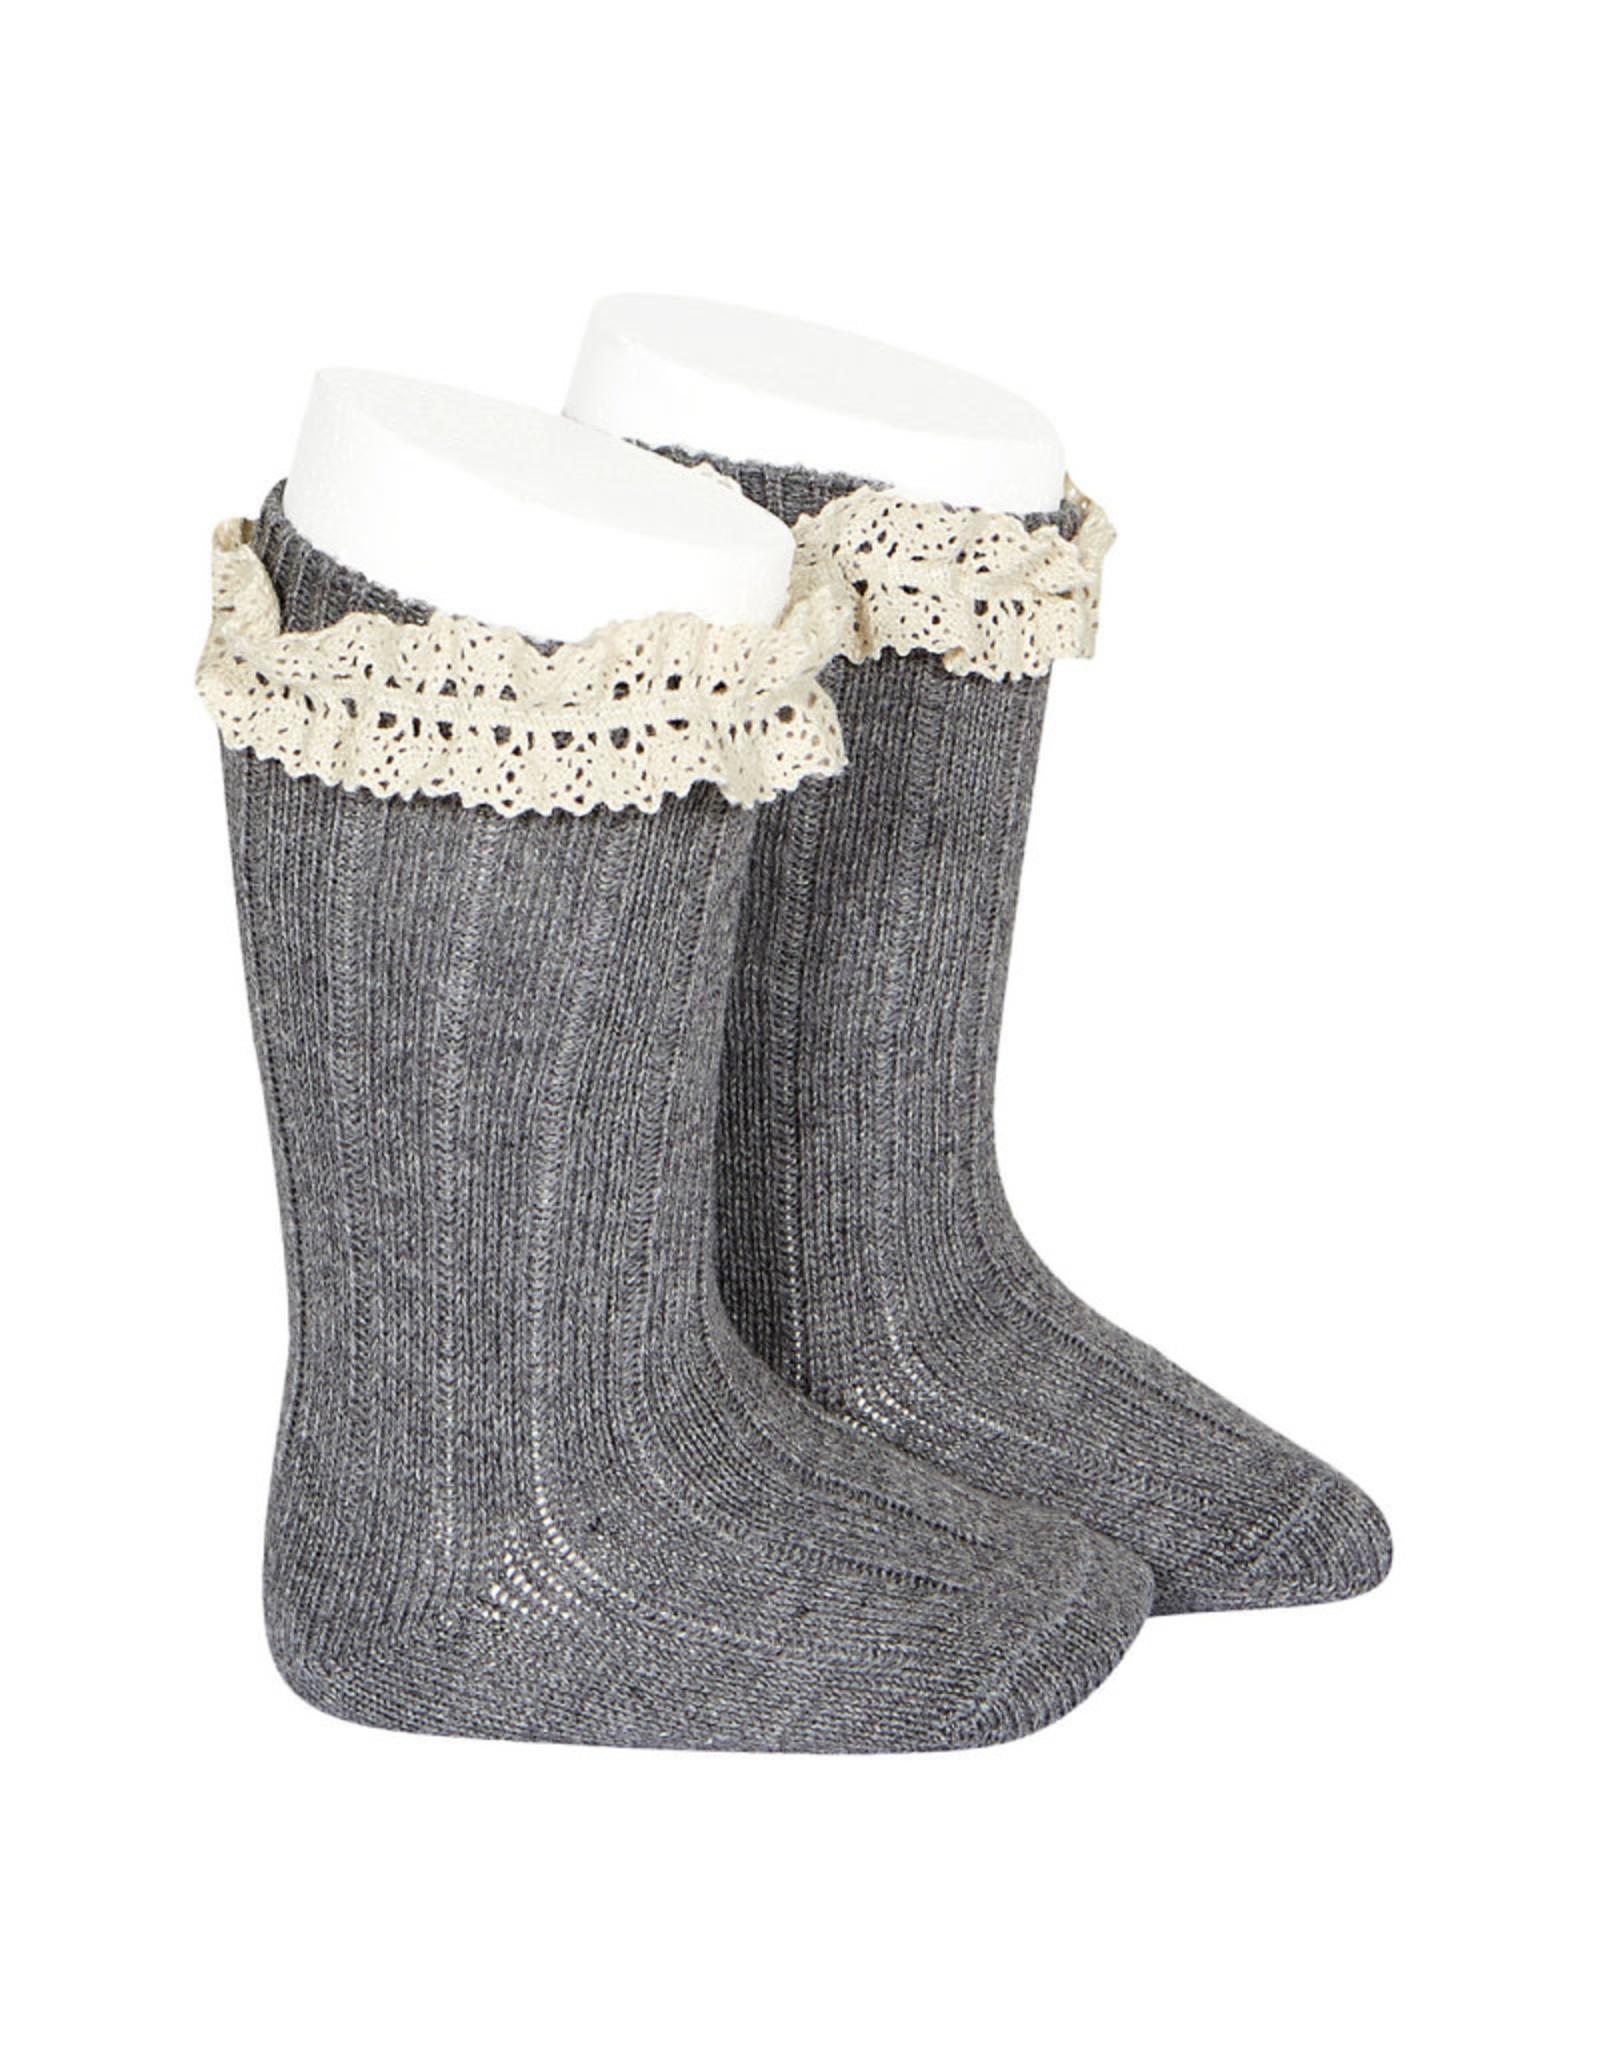 CONDOR Light Grey Vintage Lace Socks